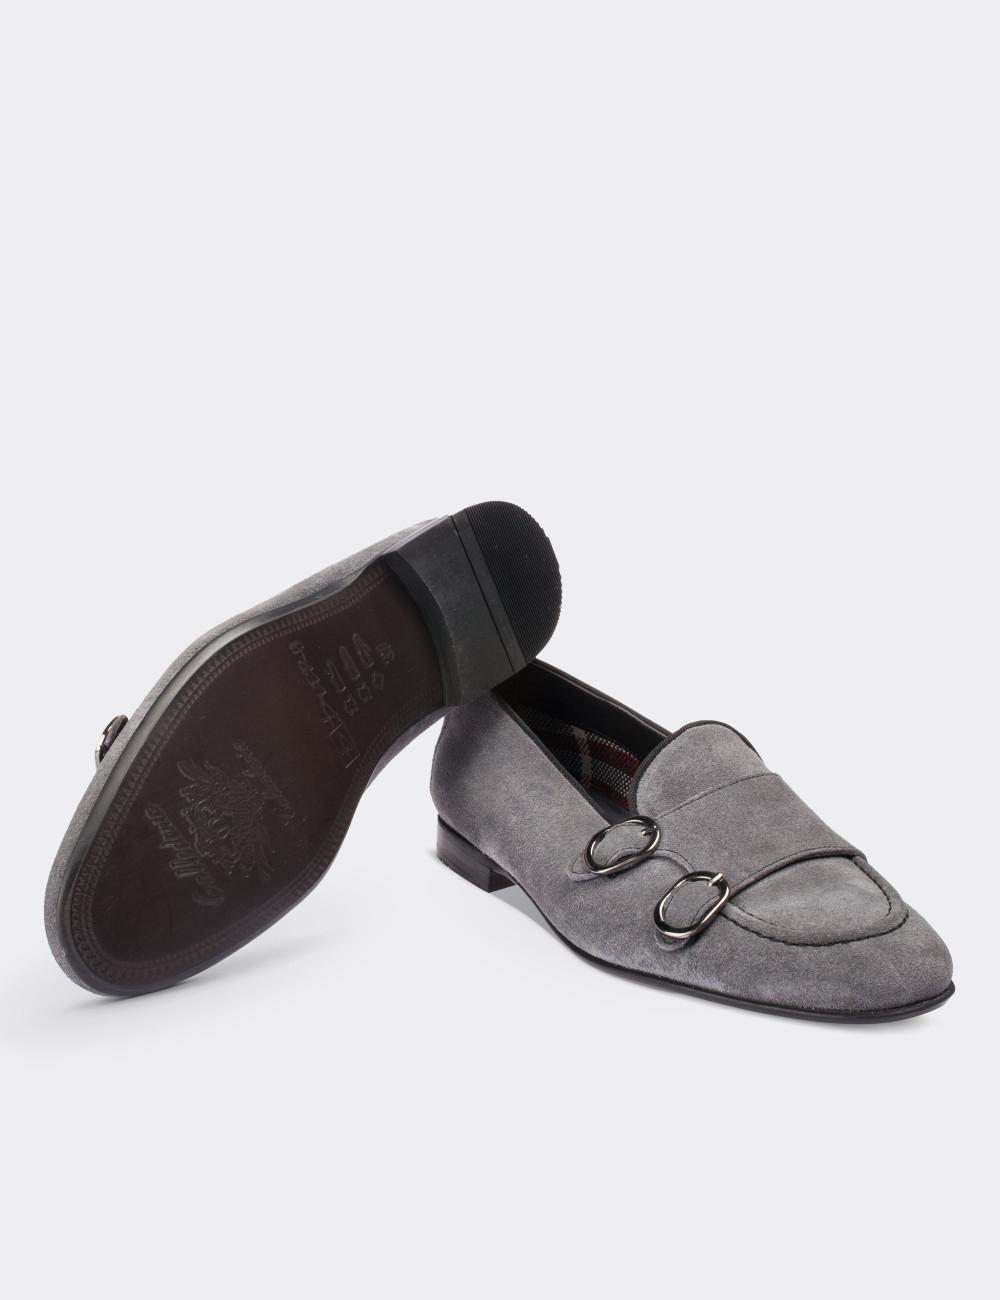 3ffb2f0c8cec5 Gray Suede Calfskin Loafers - 01617ZGRIM01